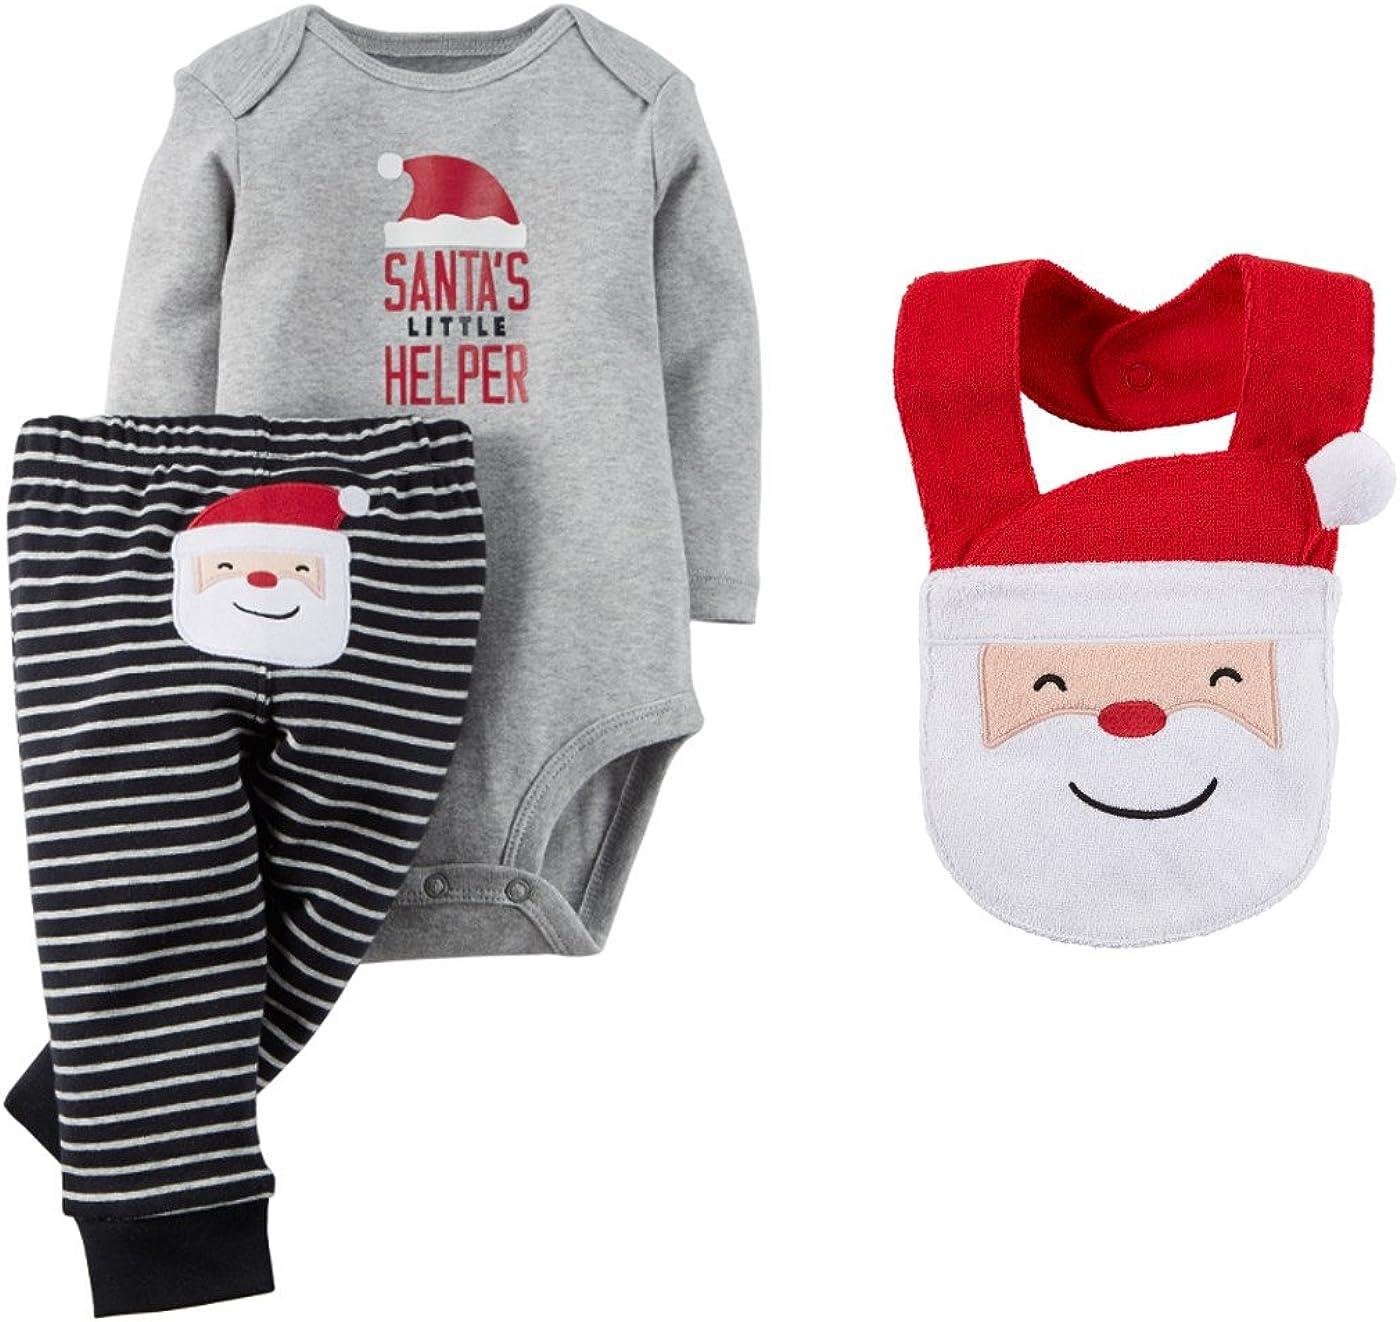 Carter's Unisex Baby Boys Girls Santa's Little Helper Bodysuit and Pants Set with Bib